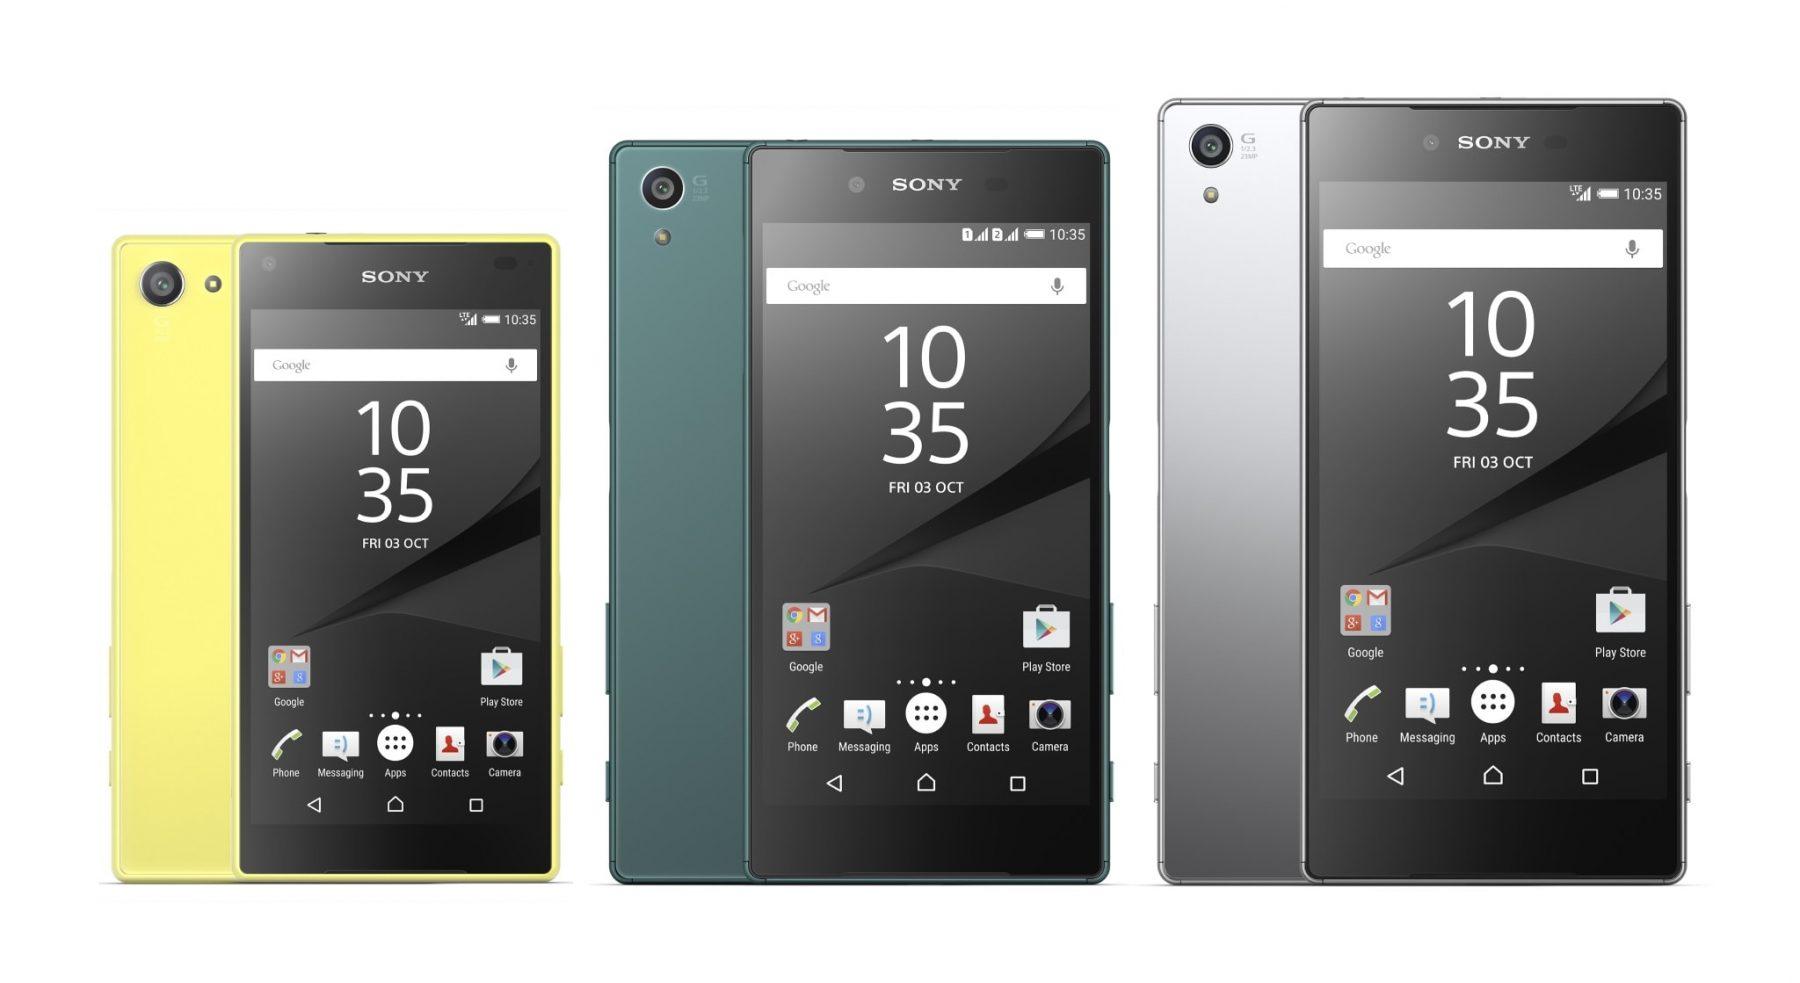 sony xperia z5 premium launch in India